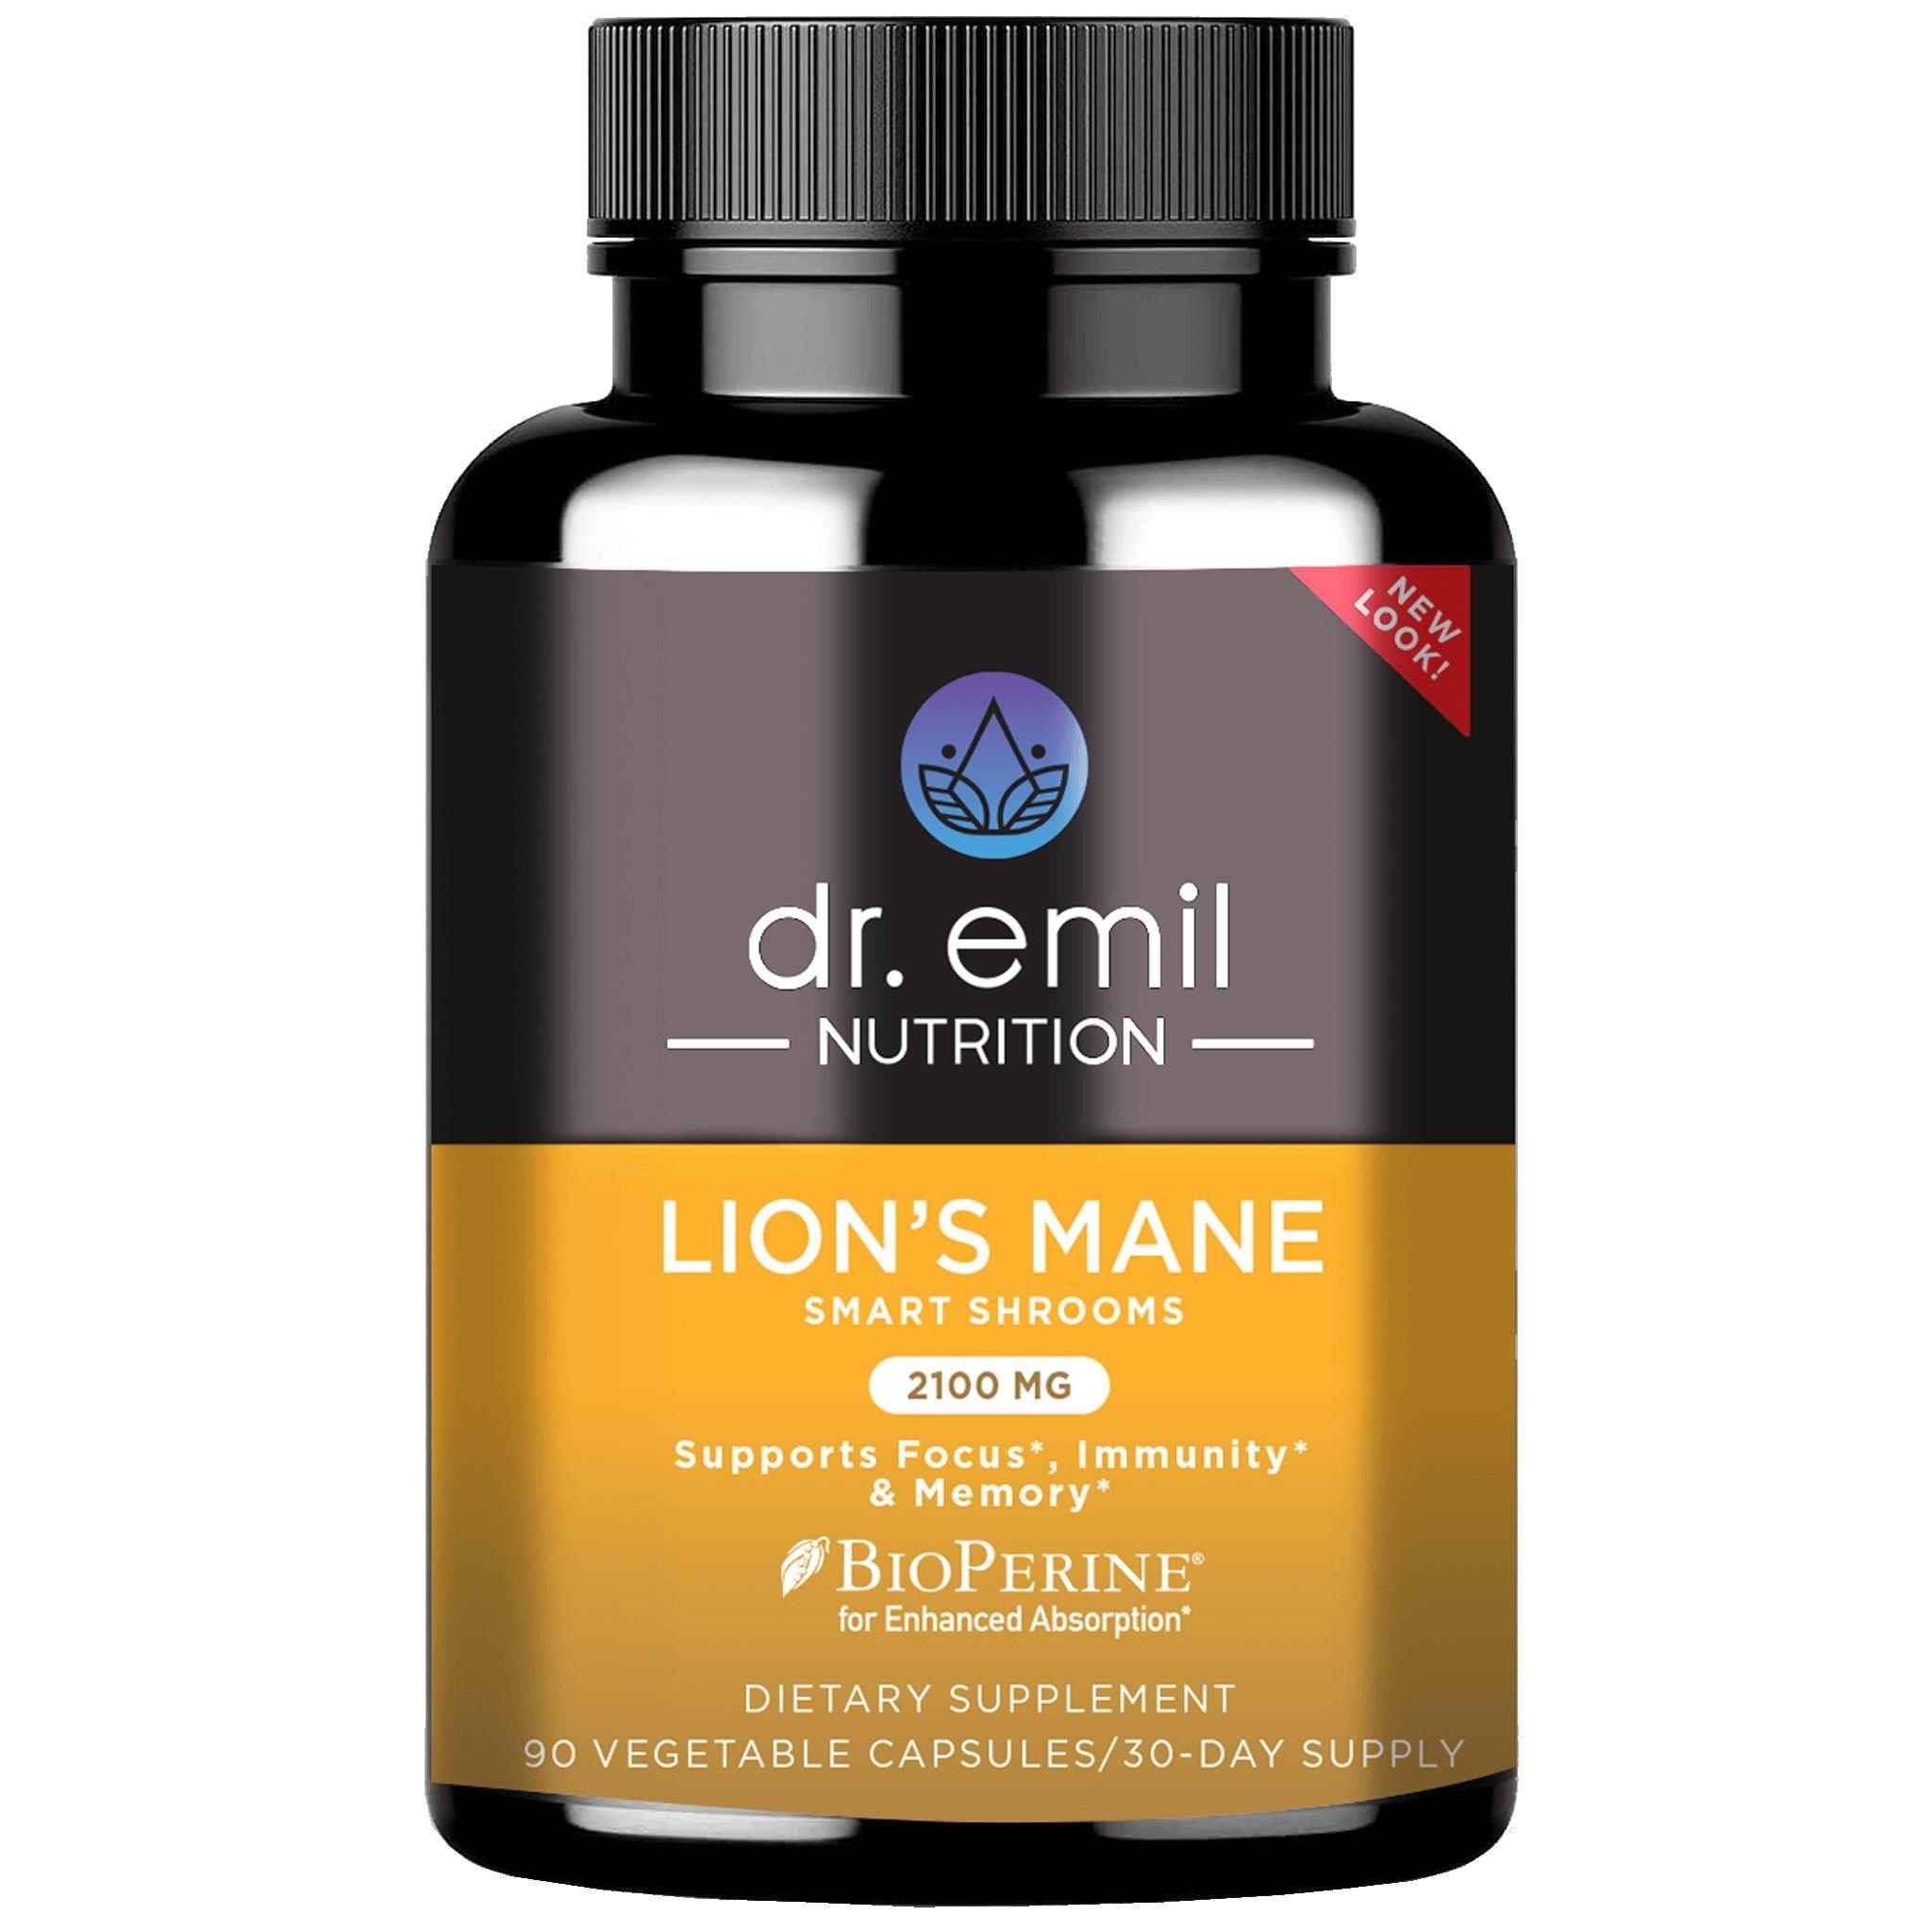 Dr. Emil Nutrition Lion's Mane